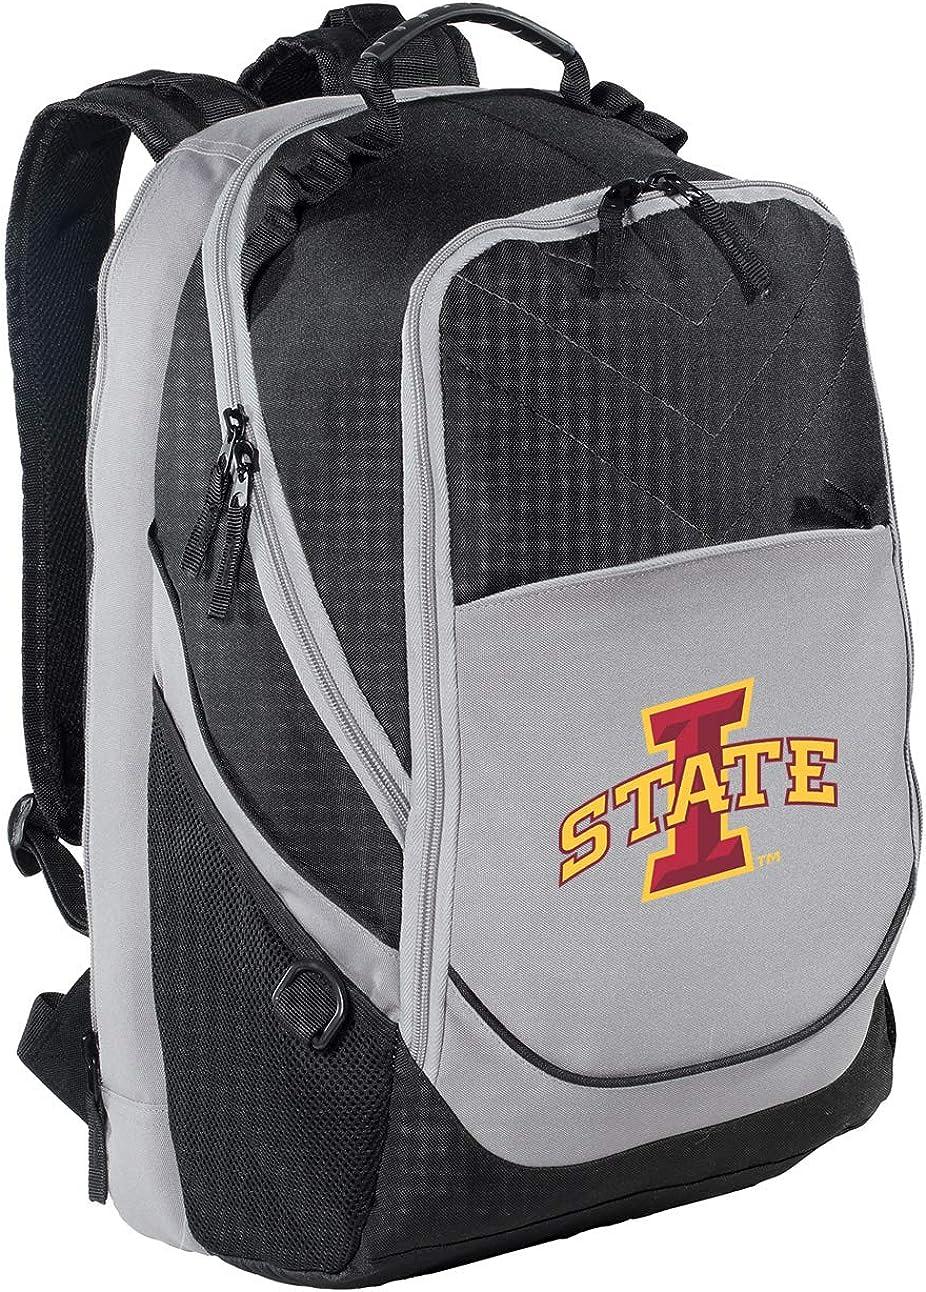 Iowa State Laptop Bag ISU Cyclones Computer Bag NCAA MESSENGER BAGS